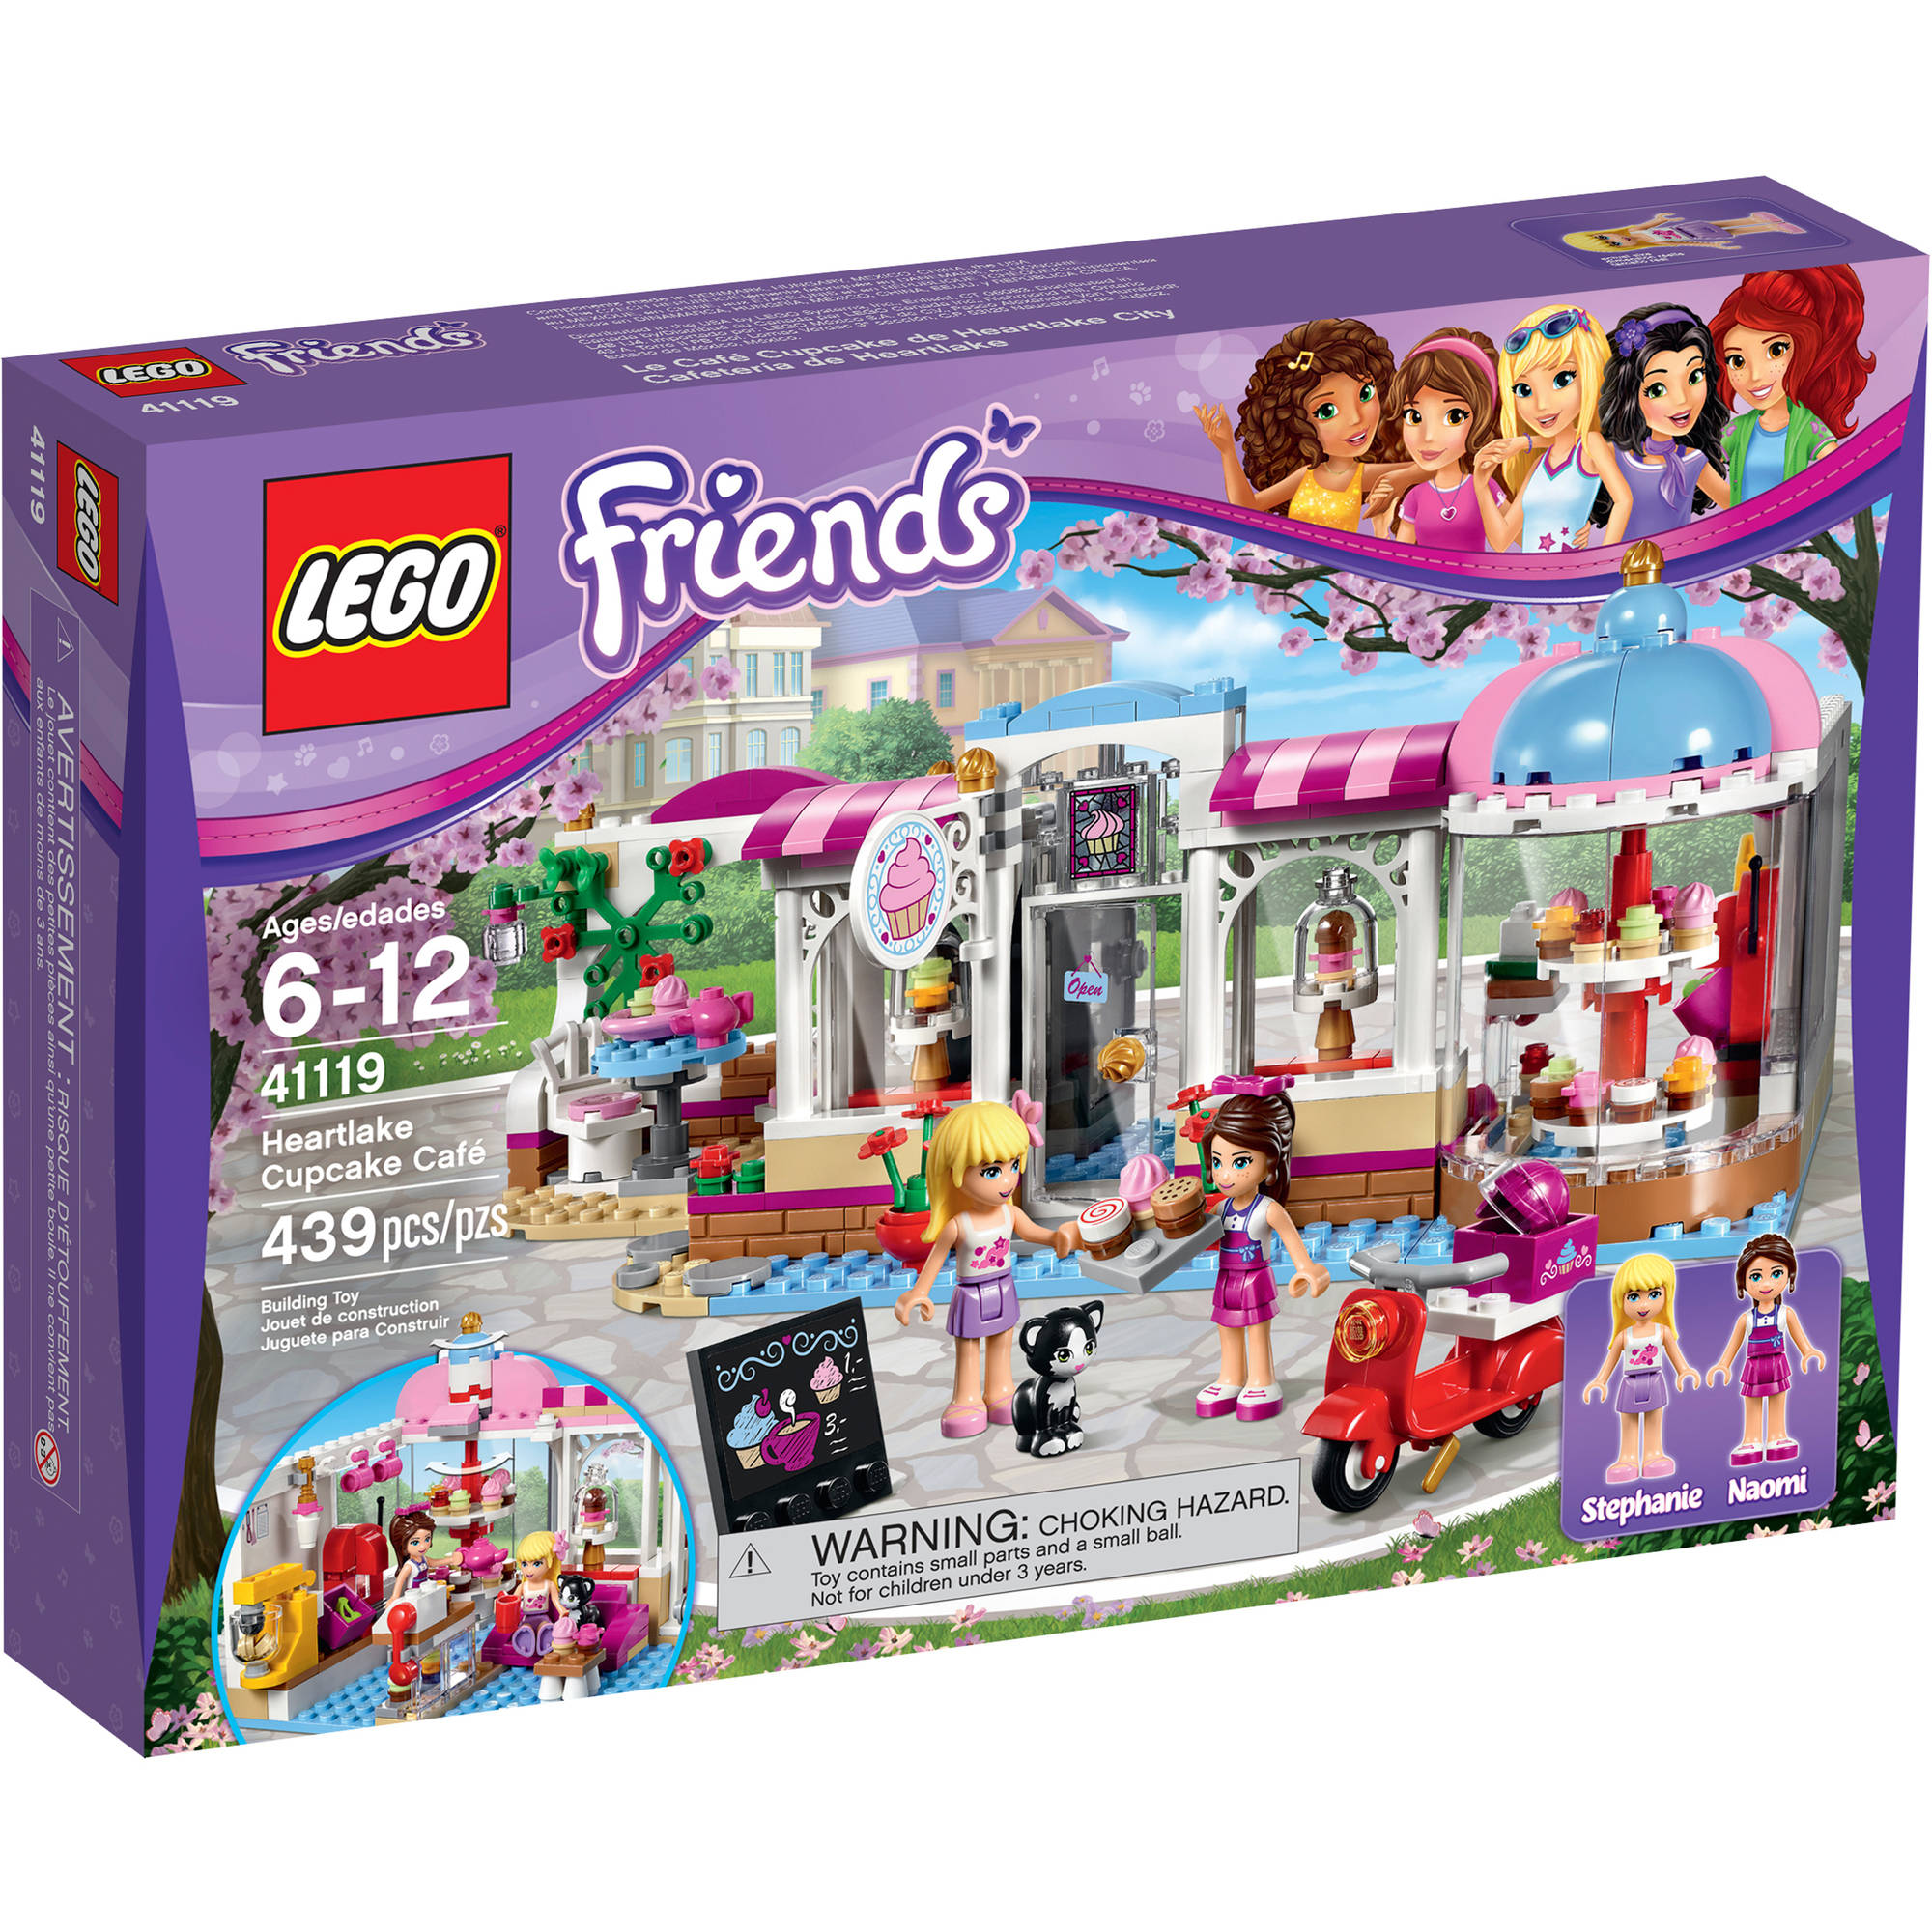 LEGO LEGO Friends Heartlake Cupcake Cafe, 41119